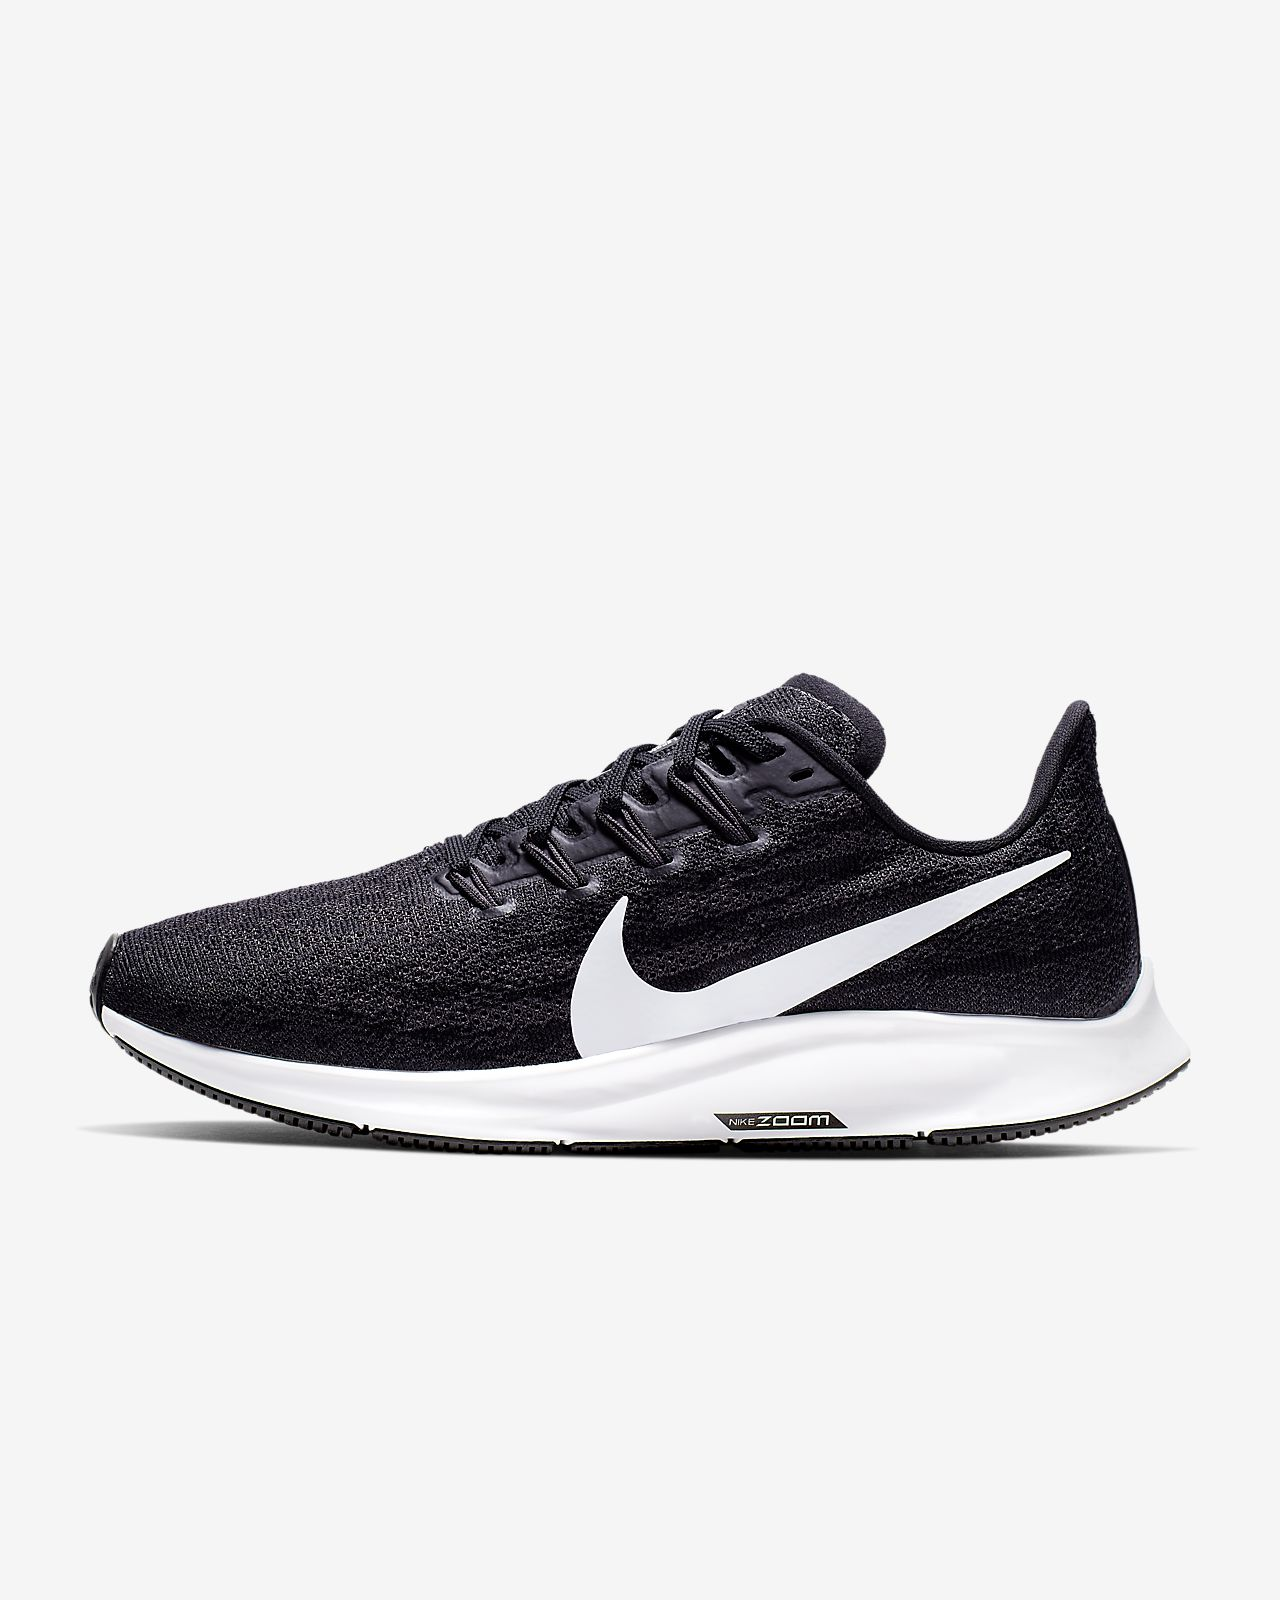 cheap for sale online store sale retailer Chaussure de running Nike Air Zoom Pegasus 36 pour Femme (large)